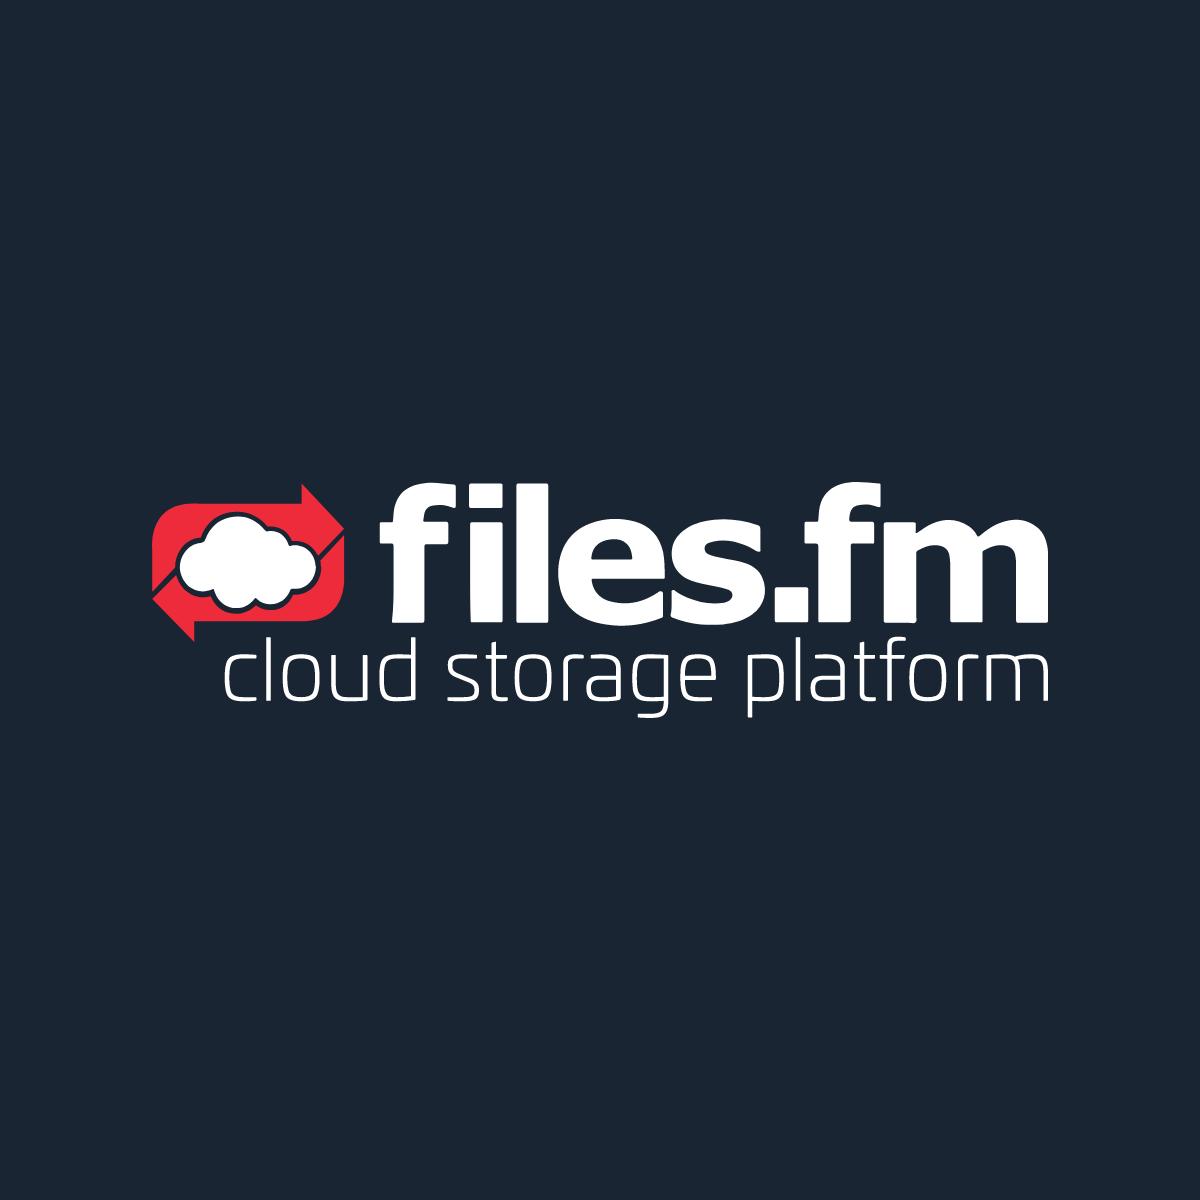 files.fm